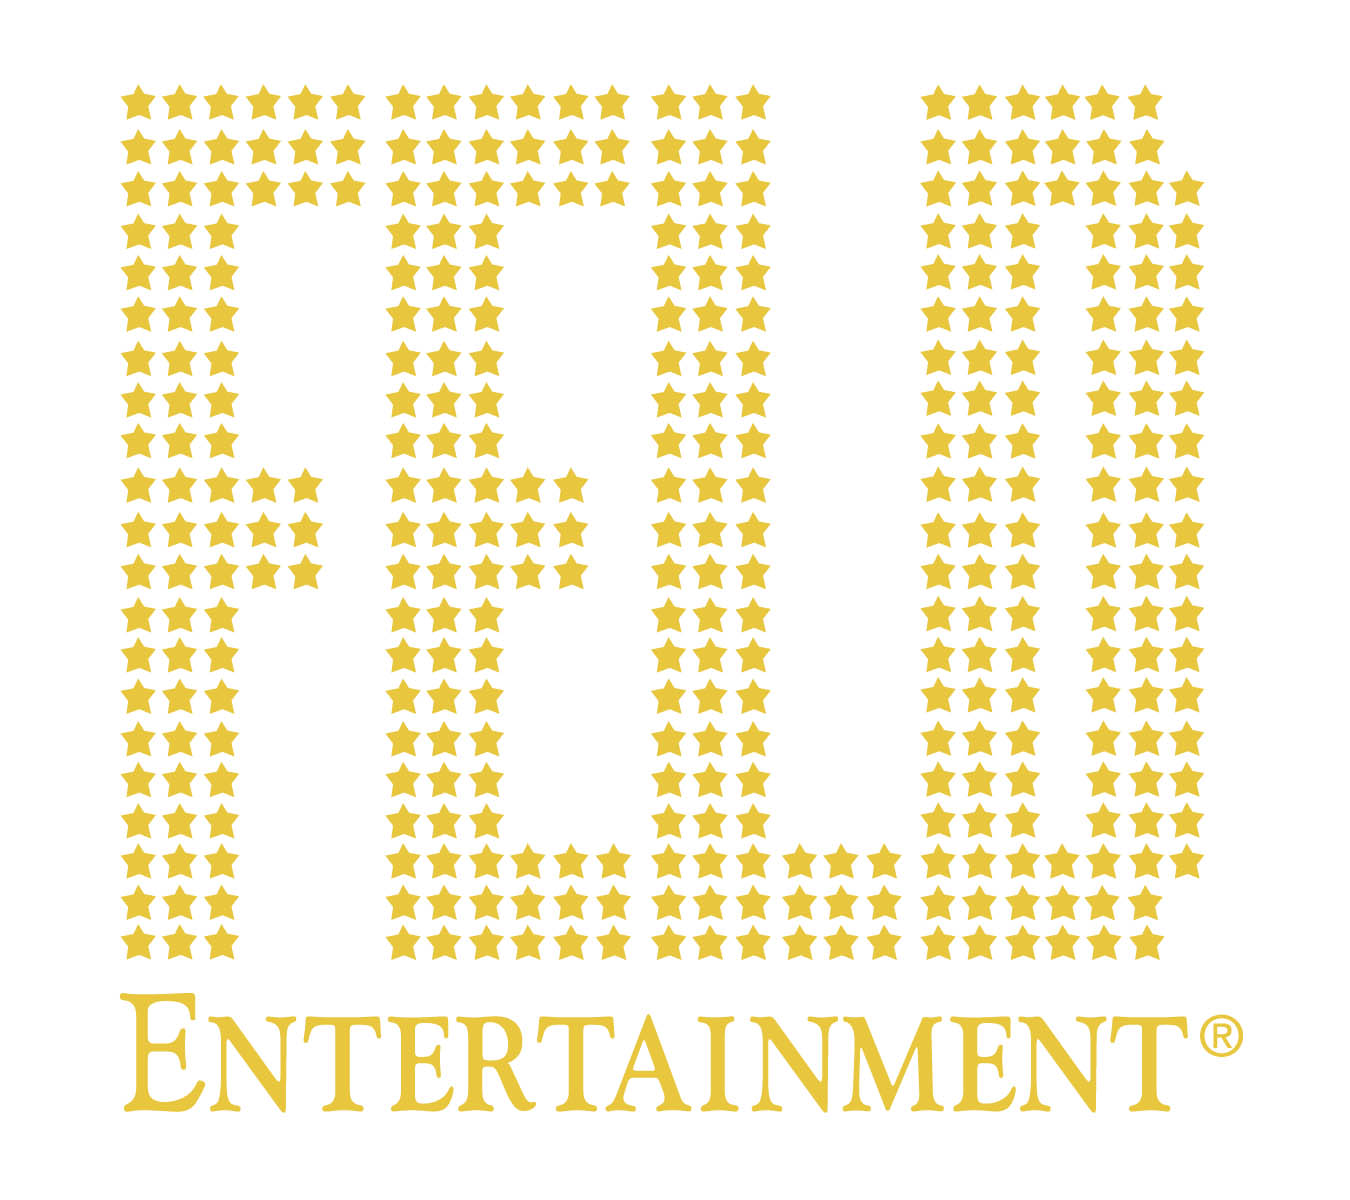 FELD_Entertainment_The_Communications_Group_PR_Events_Little_Rock_AR.jpg